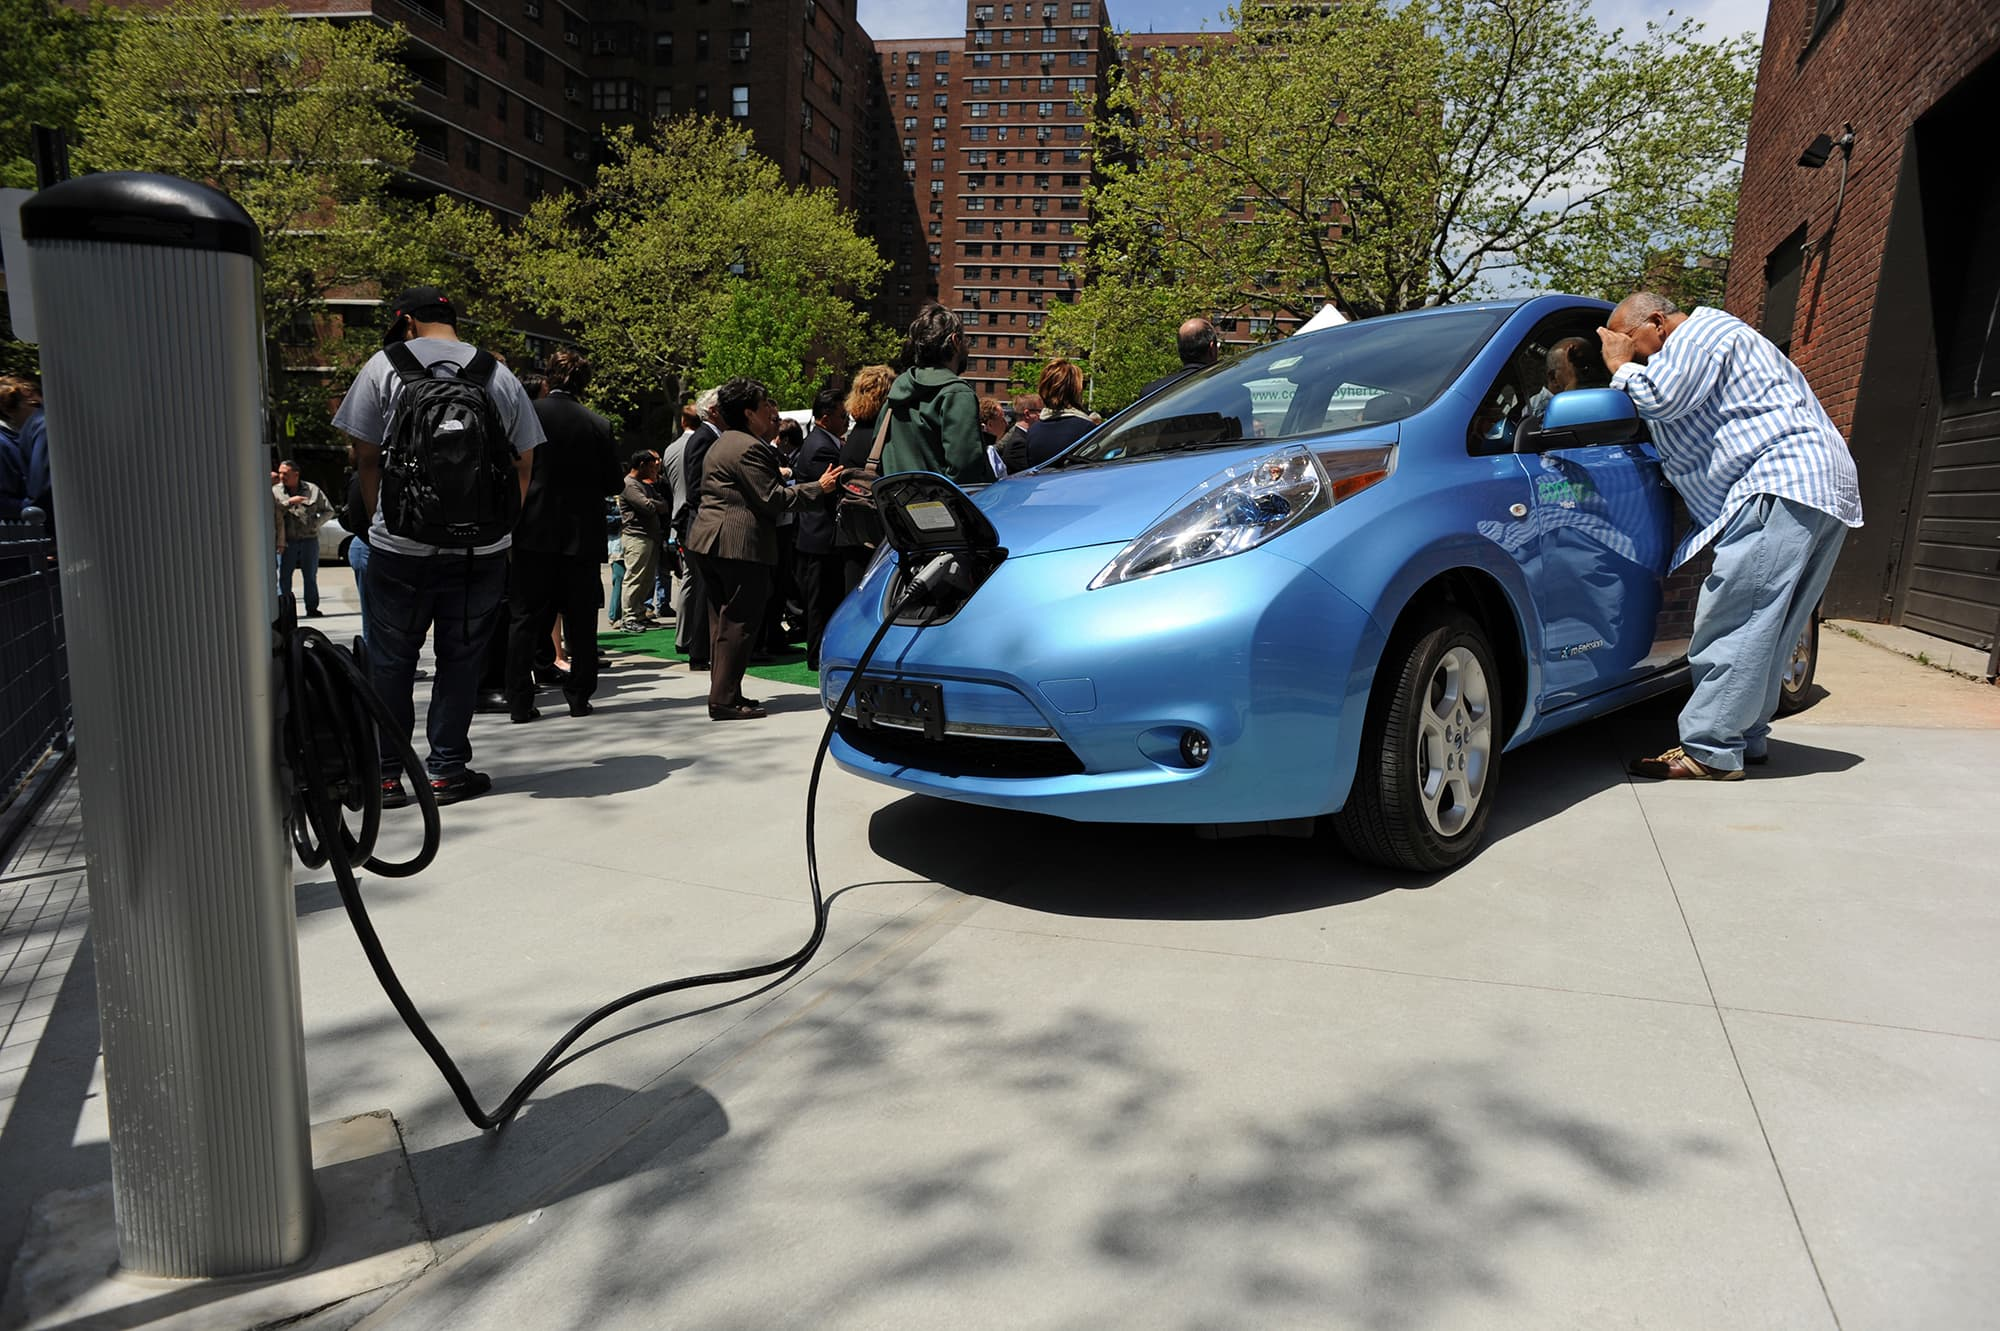 Premium: Nissan Leaf electric vehicle